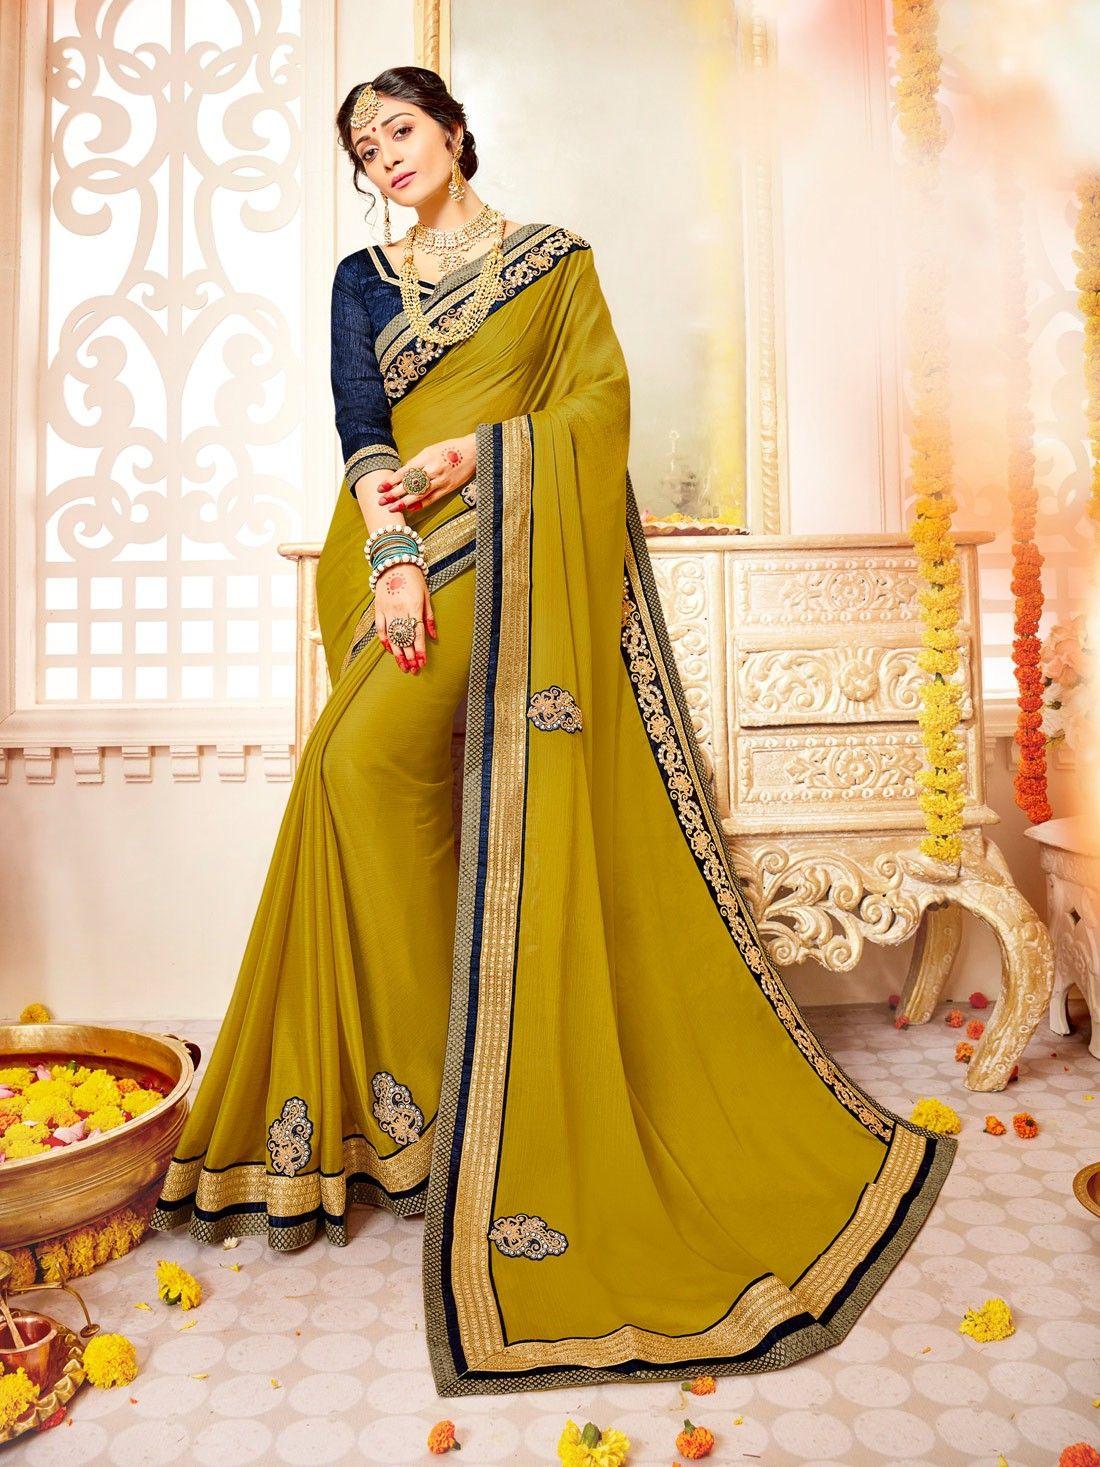 b4d5ff4e54c7b1 fancy mehndi green partywear saree with contrast blue raw silk blouse